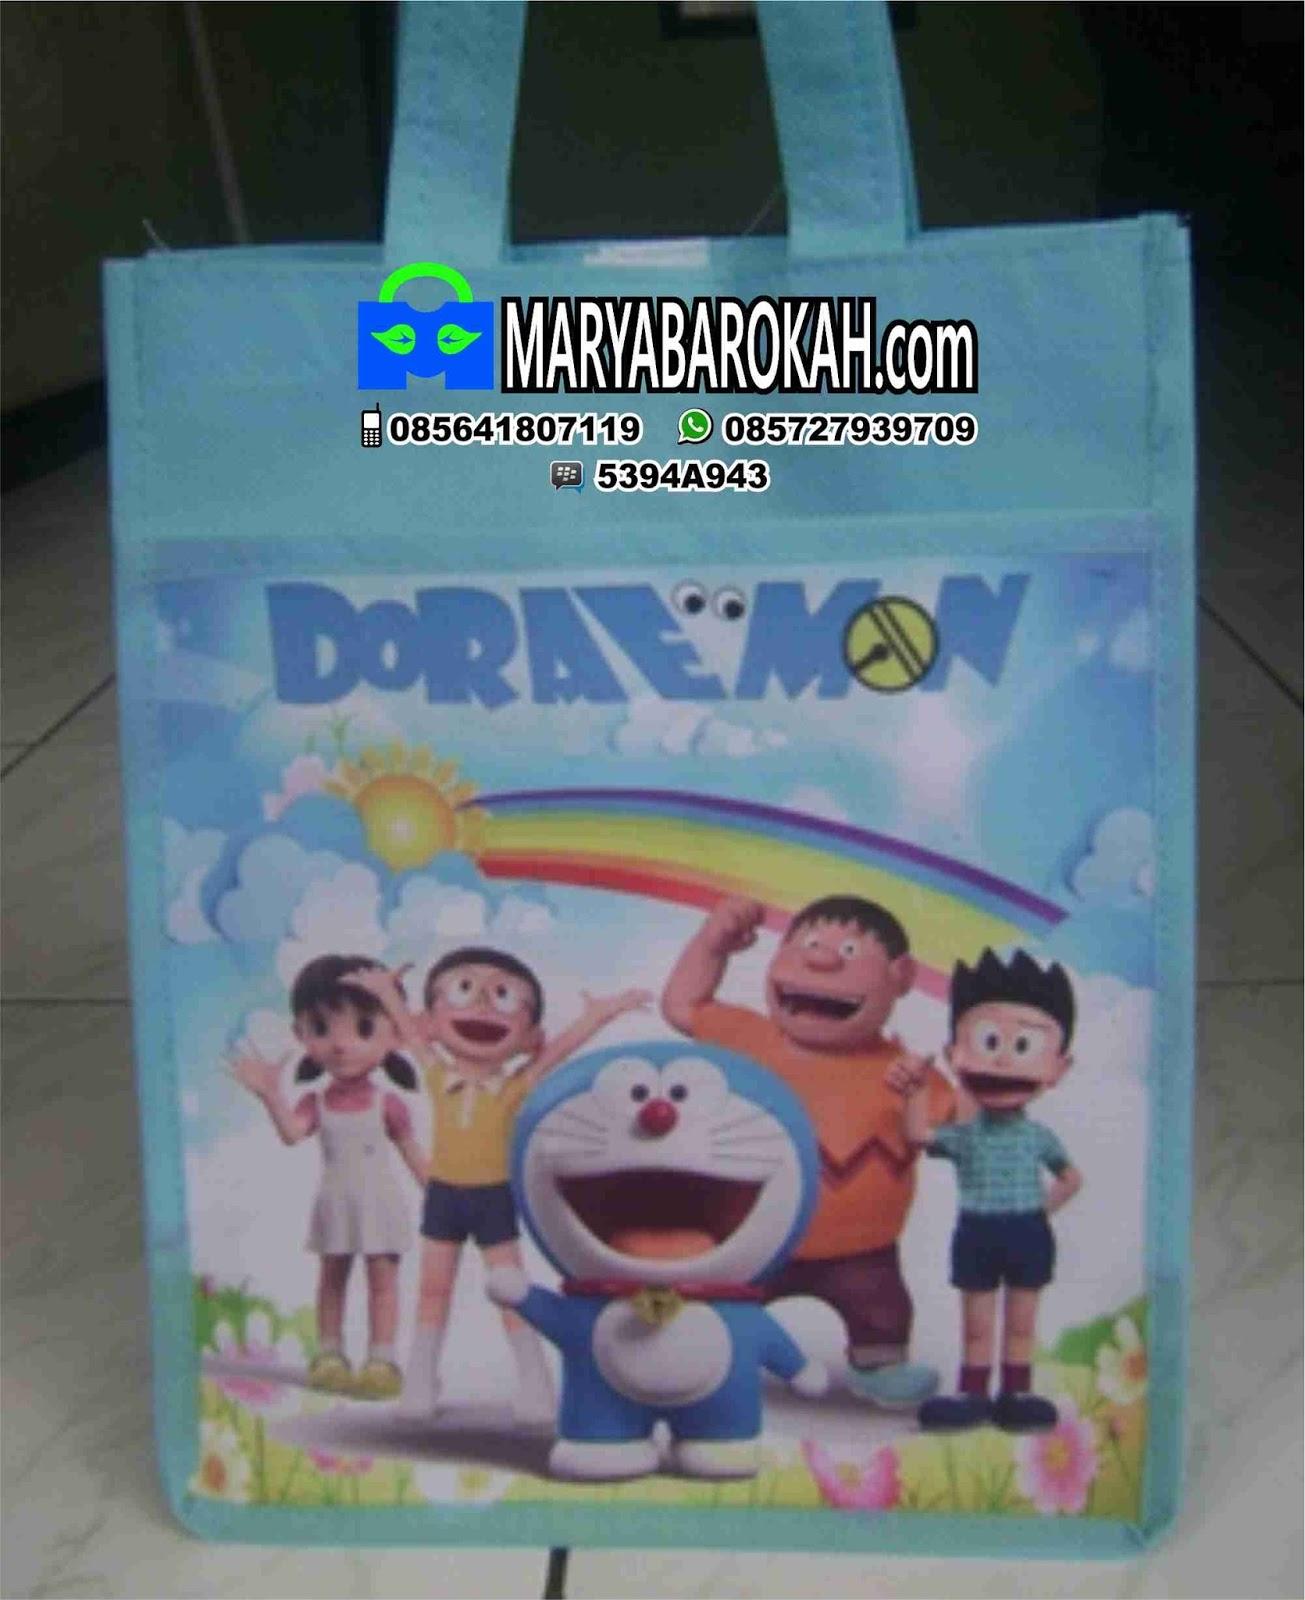 Marya Store Produsen Tas Ultah Anak Undangan Murah Doraemon